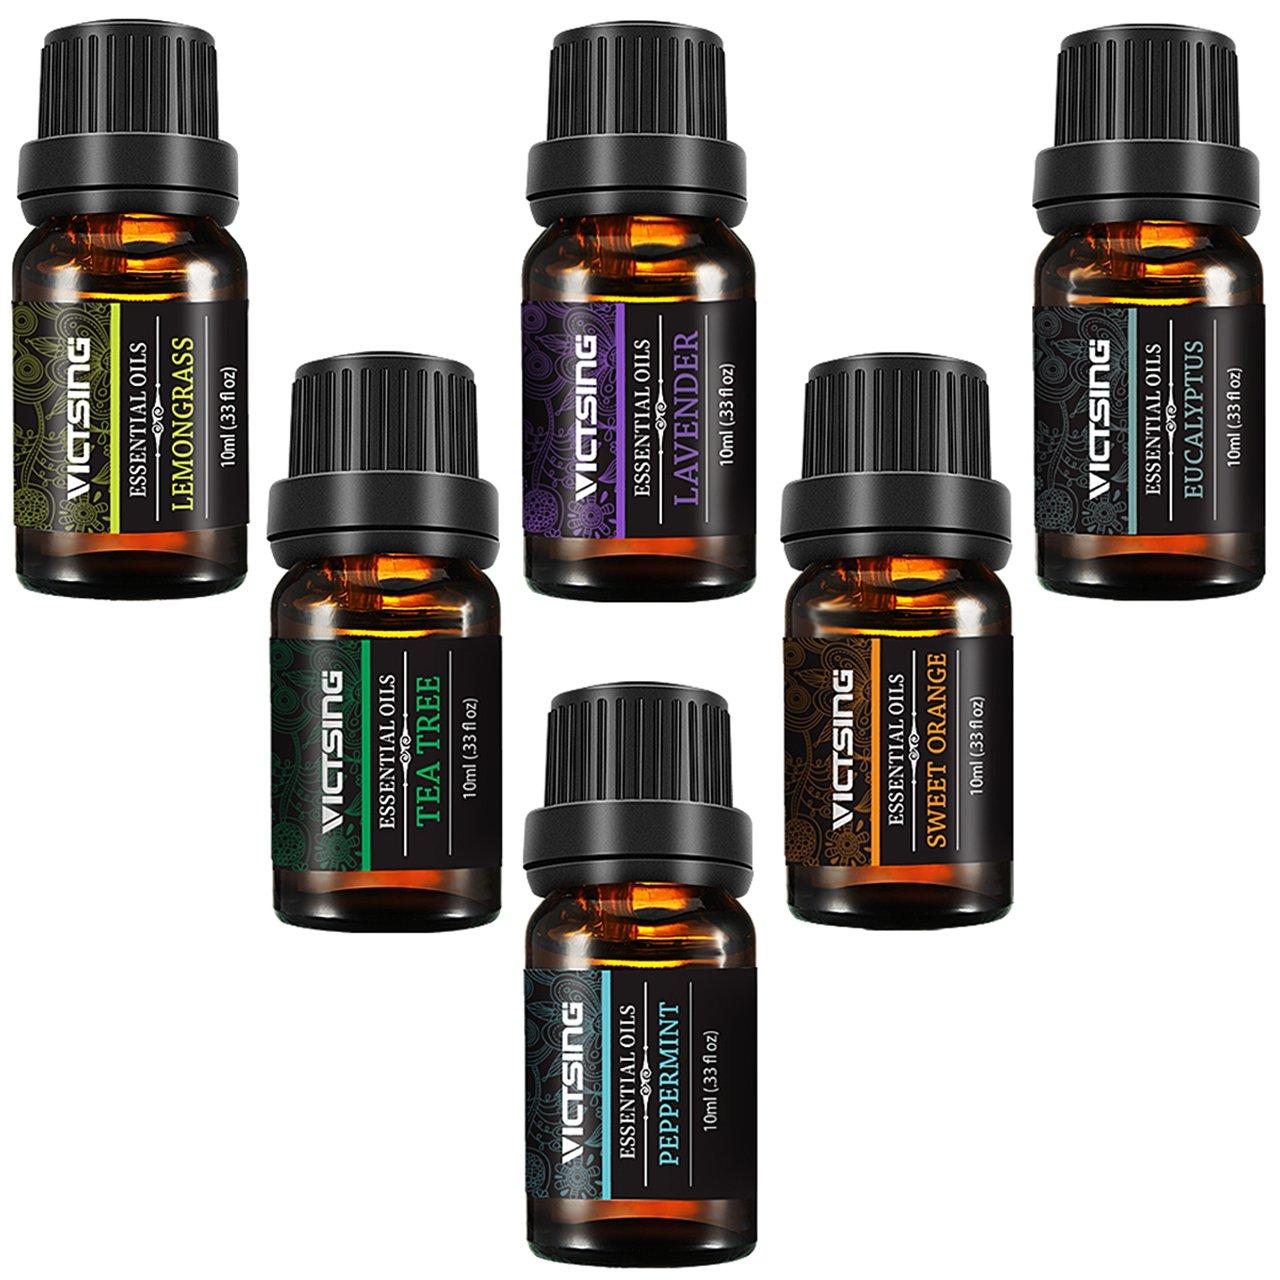 VicTsing Natural Essential Oils Set, Top 6 Pure Therapeutic Grade Upgraded Aromatherapy Essential Oil Gift Set(Lavender, Tea Tree, Peppermint, Eucalyptus, Lemongrass, Orange, 10ml/bottle)